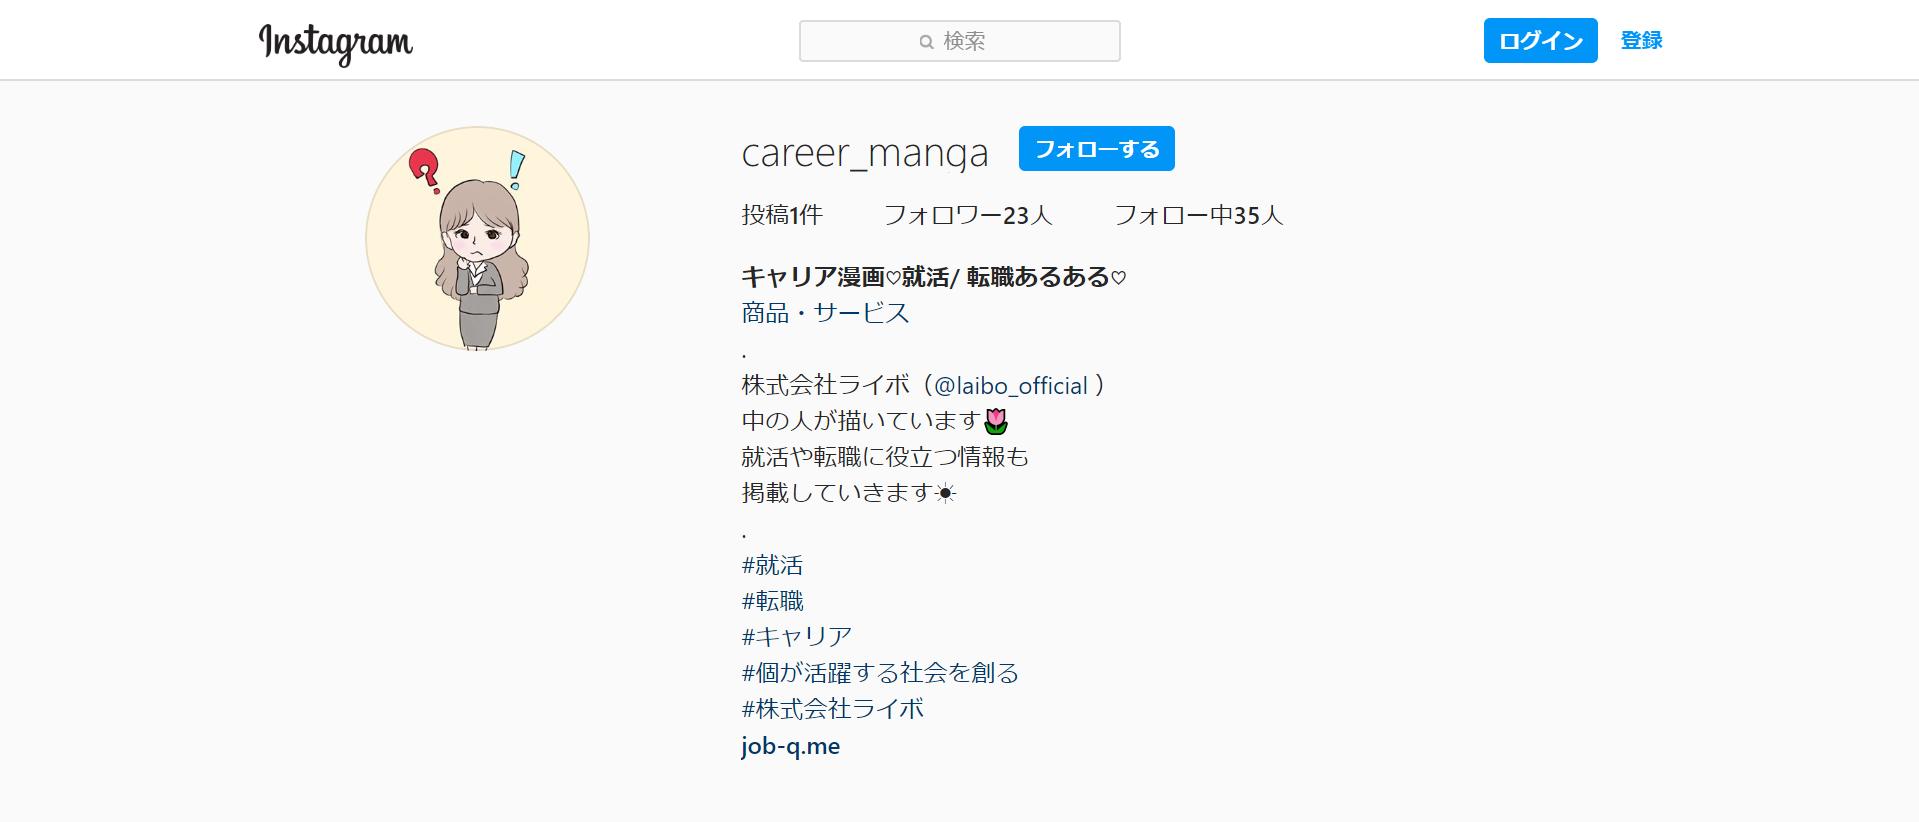 screencapture-instagram-career-manga-2020-05-06-18_42_35